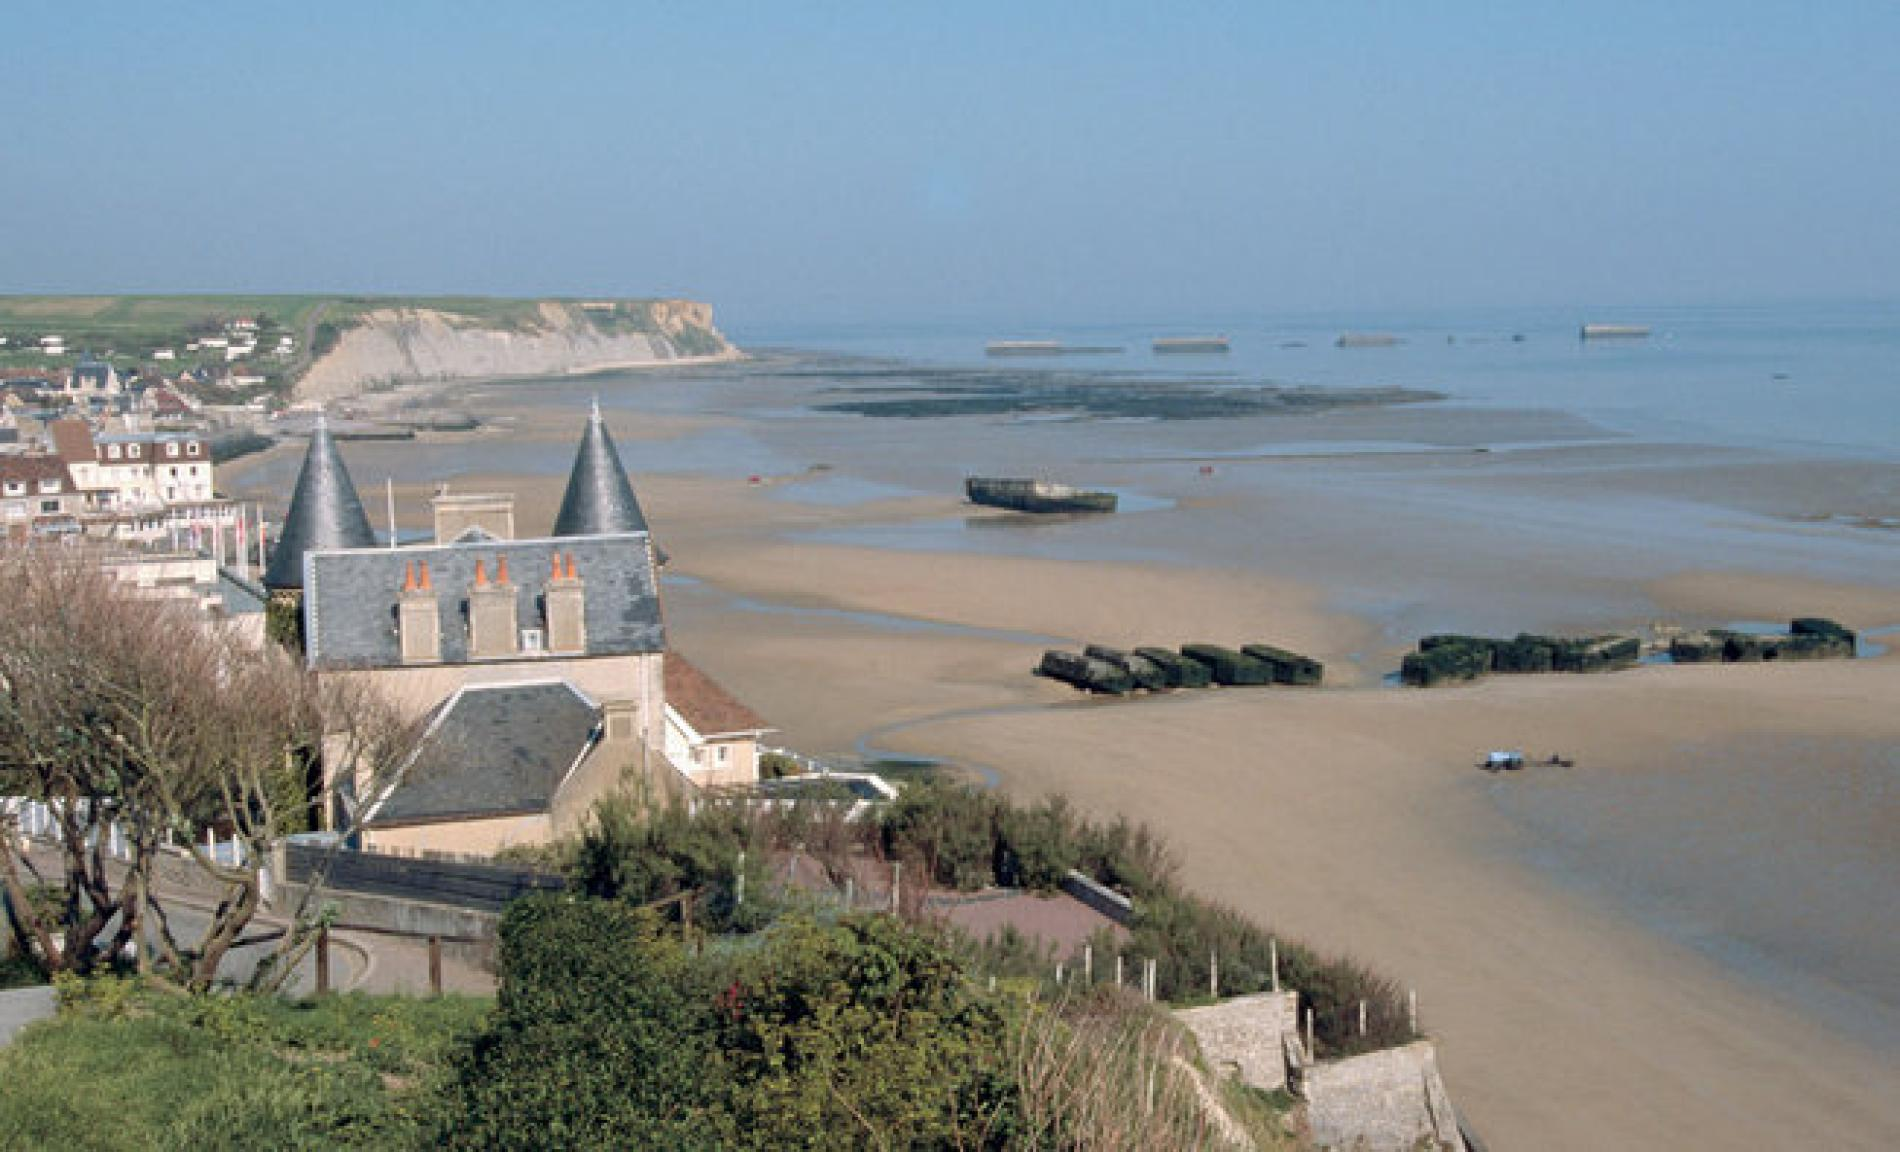 London To Normandy Beaches Tour 2020